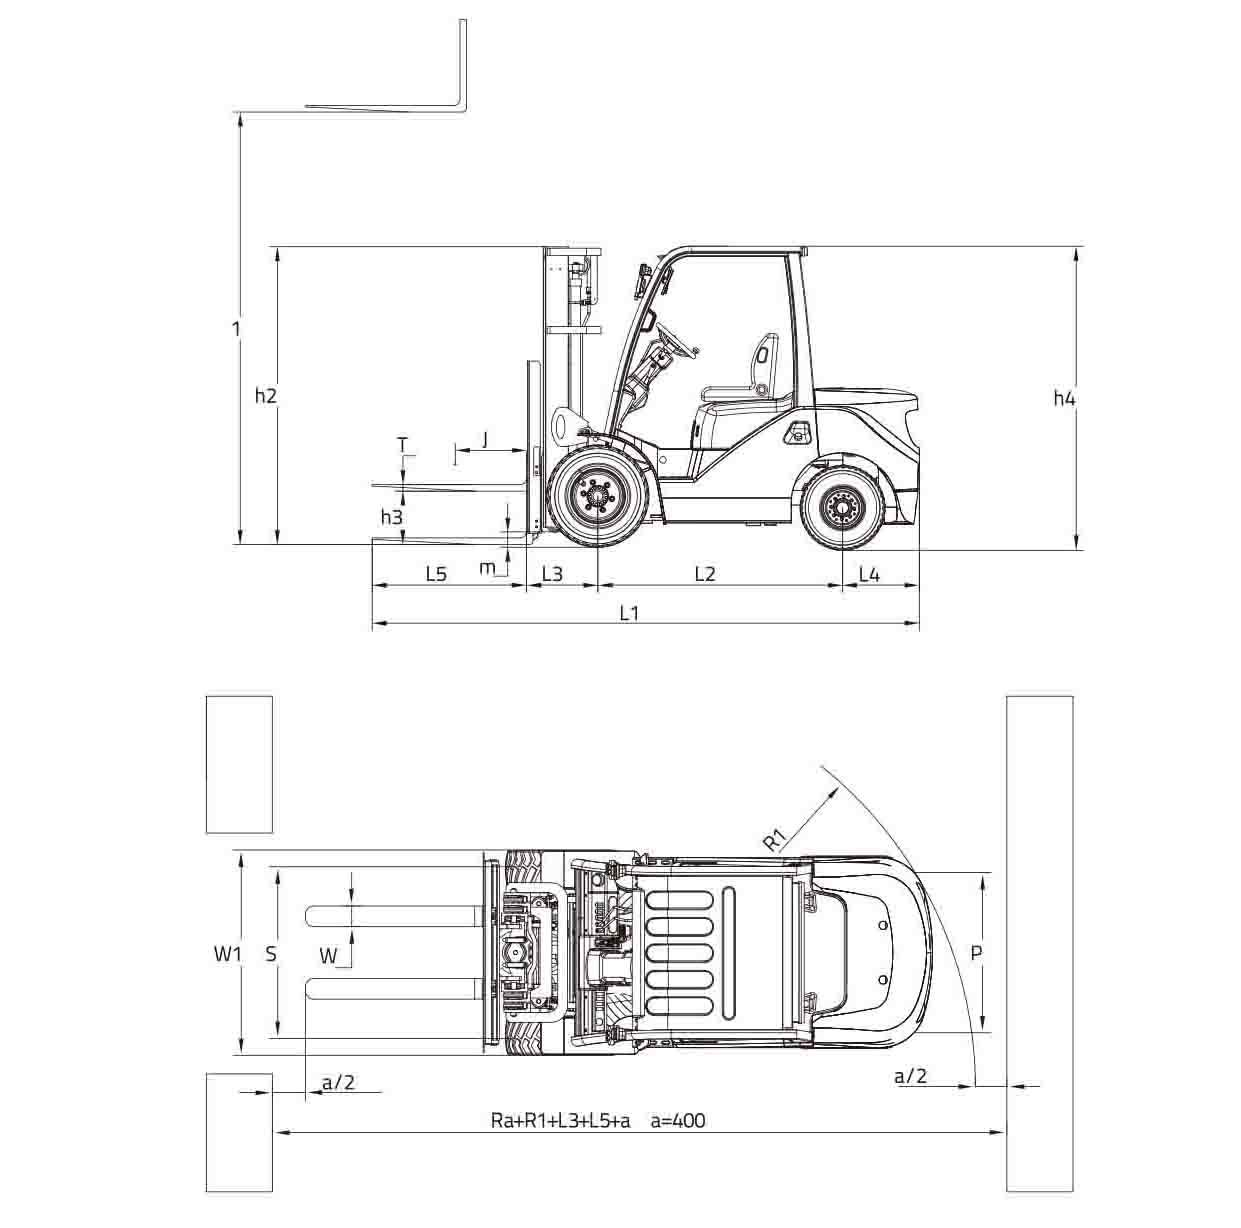 Размеры вилочного погрузчика FD20H (FD25H, FD30H, FD35H) Zoomlion